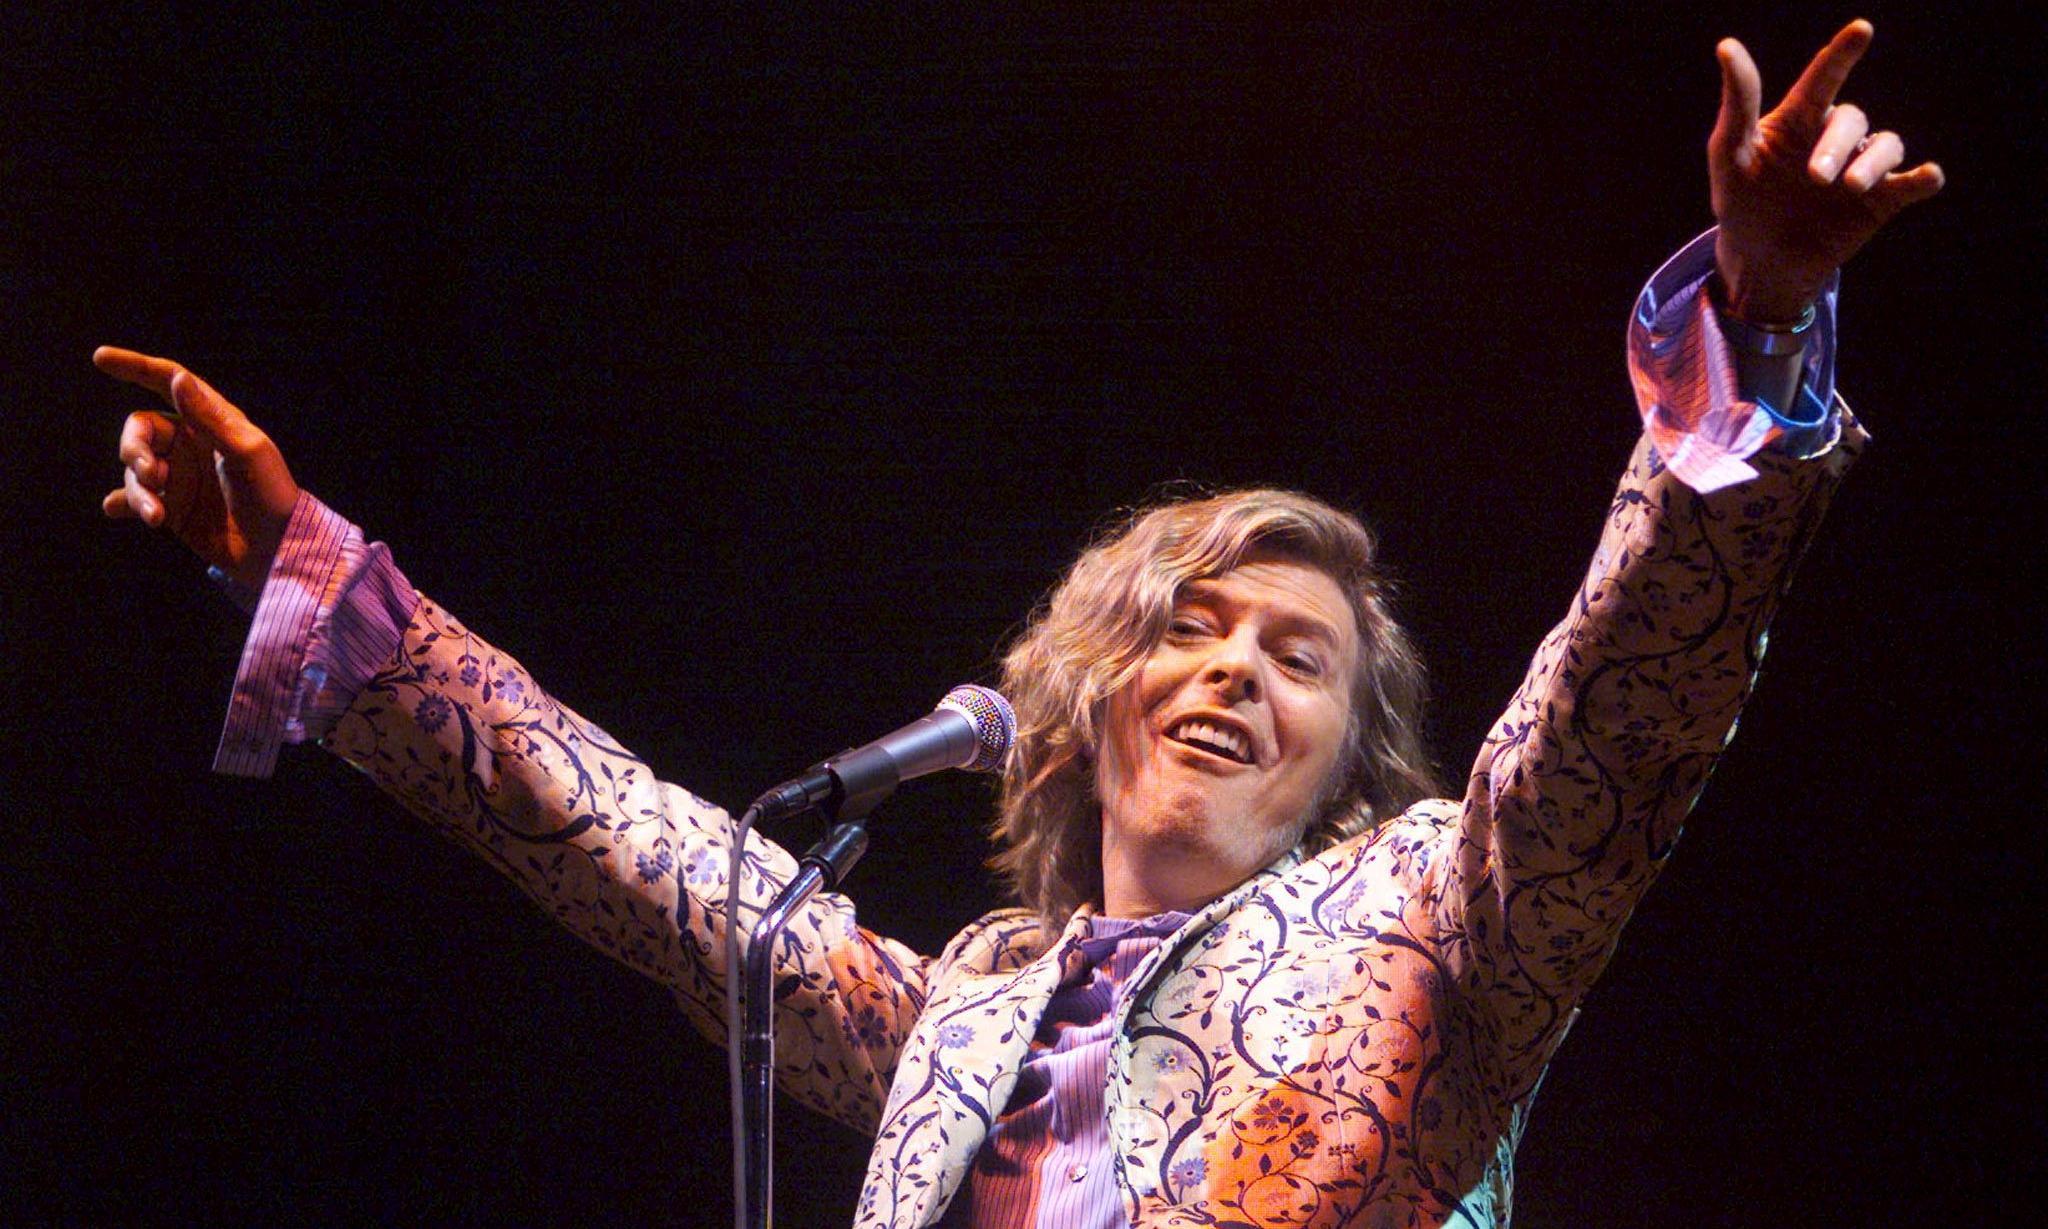 TV tonight: celebrating Glastonbury's greatest, from Bowie to Adele